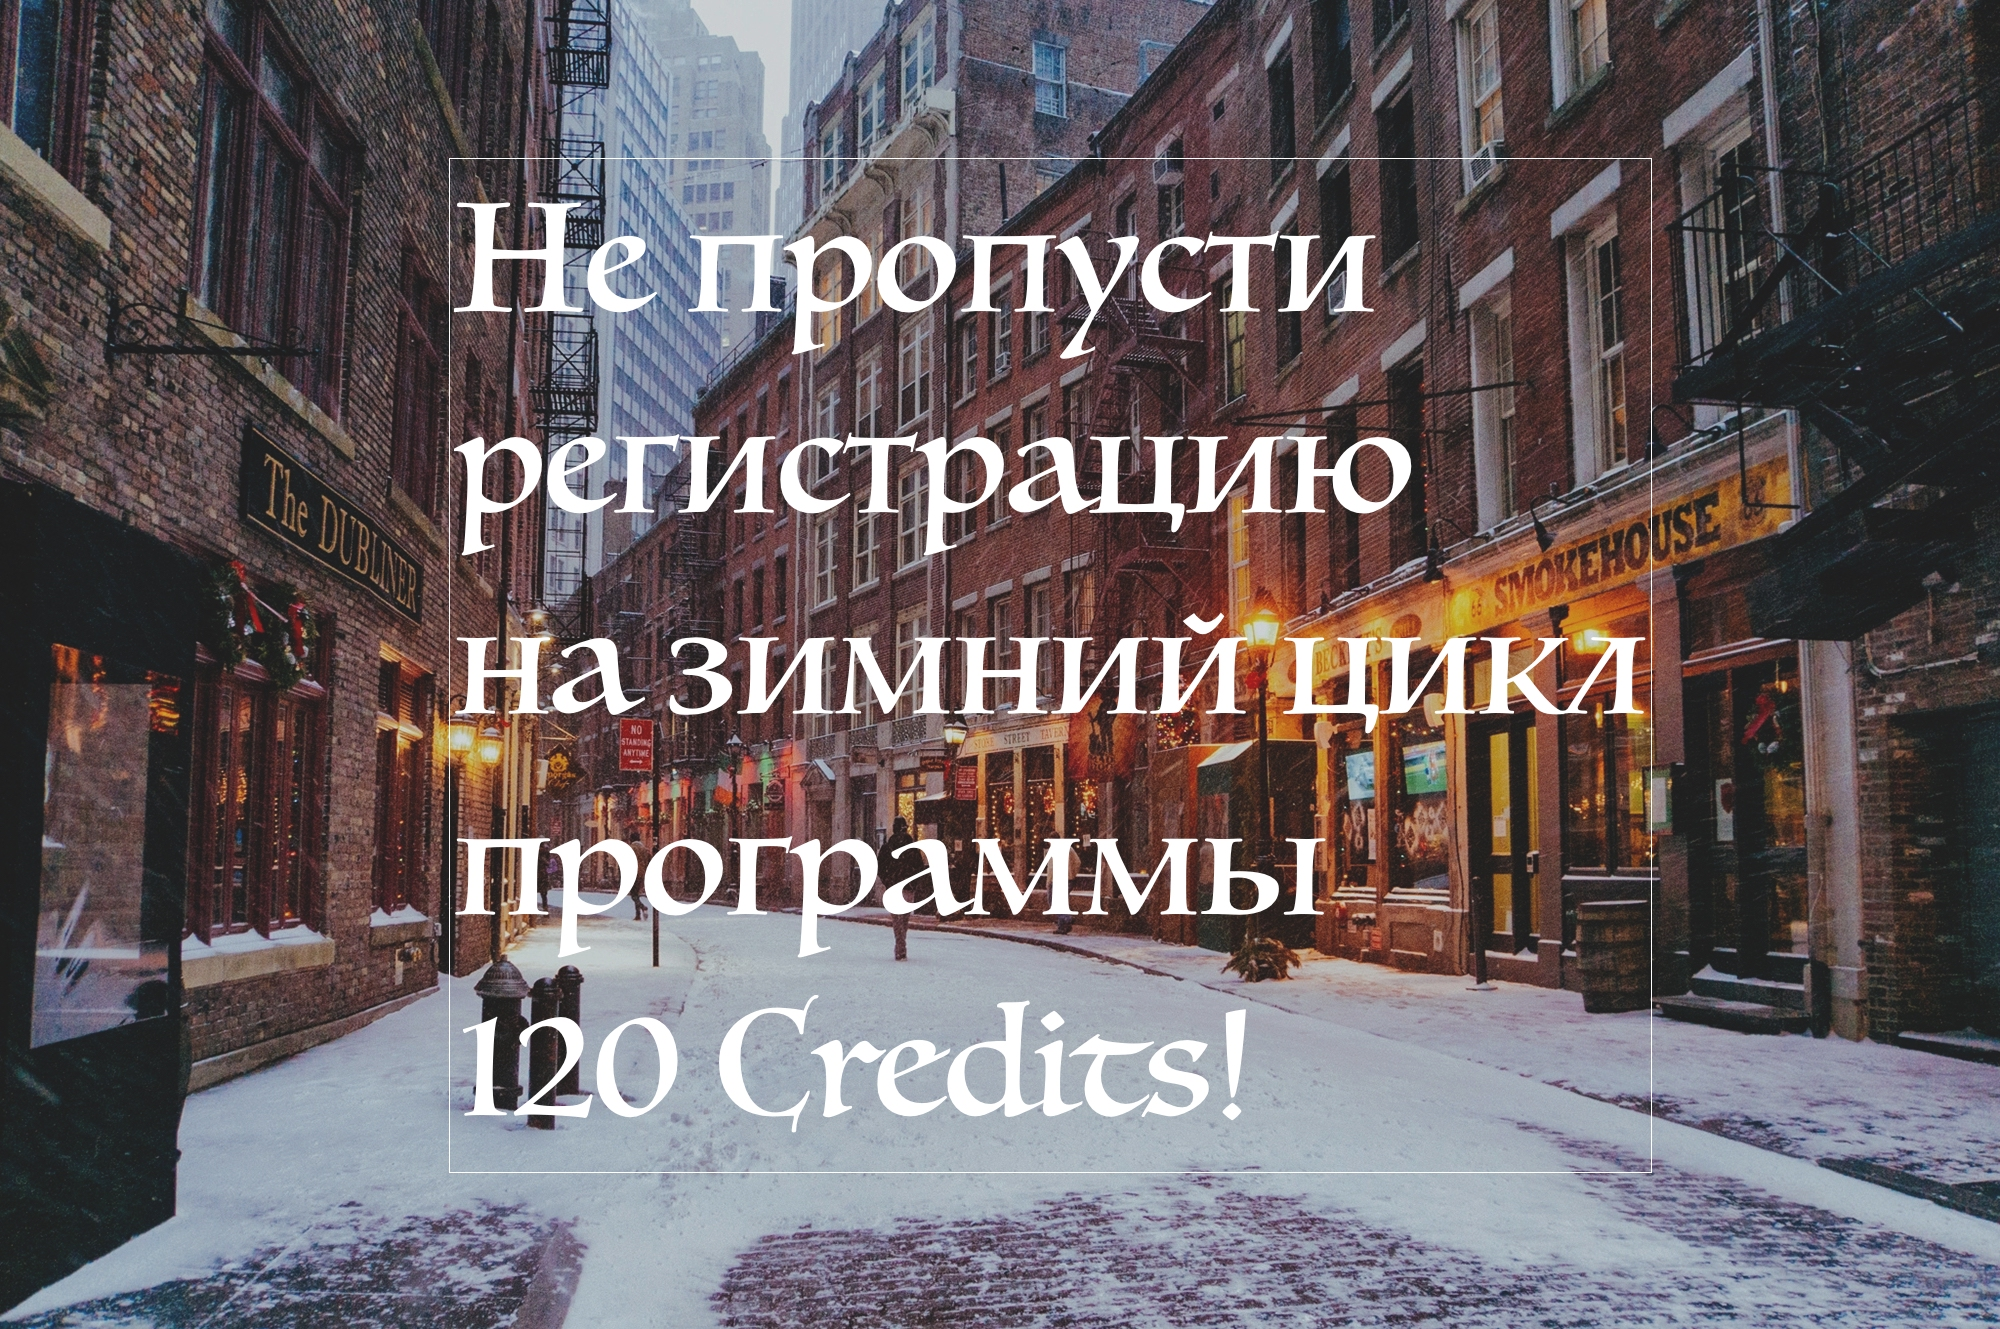 Регистрация на 120 Credits скоро закончится!